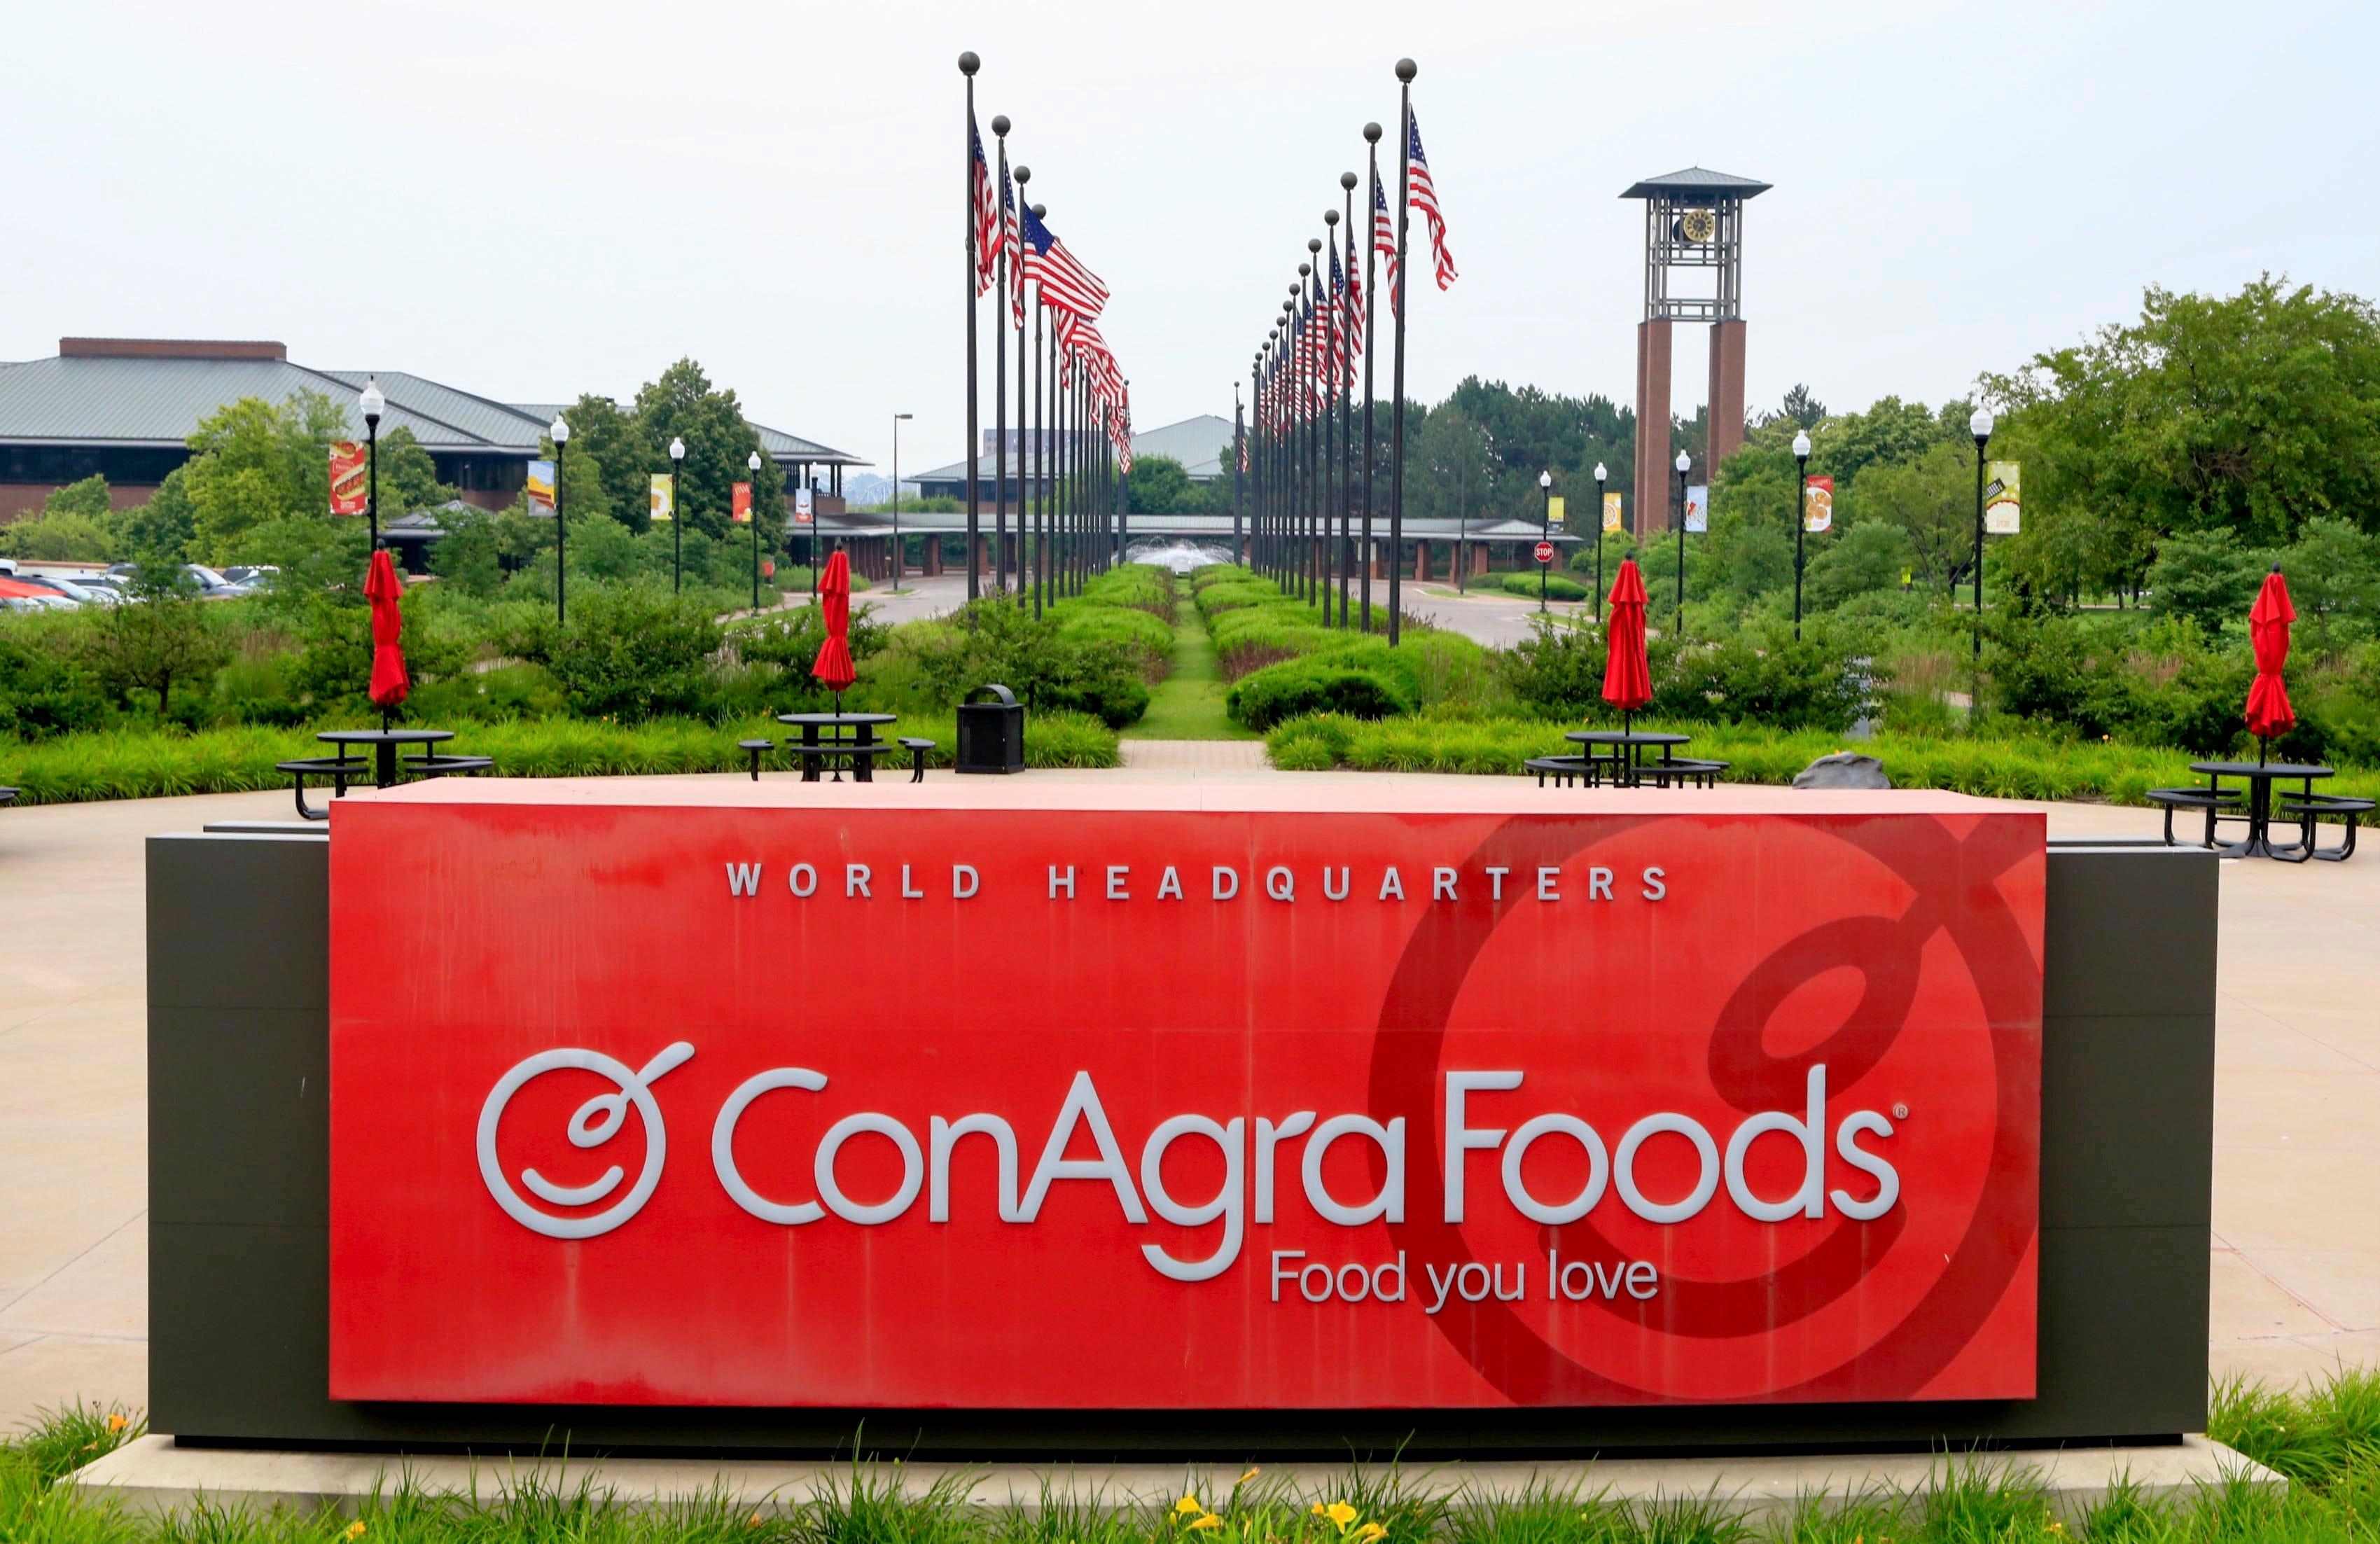 Conagra is buying Boomchickapop popcorn's parent company